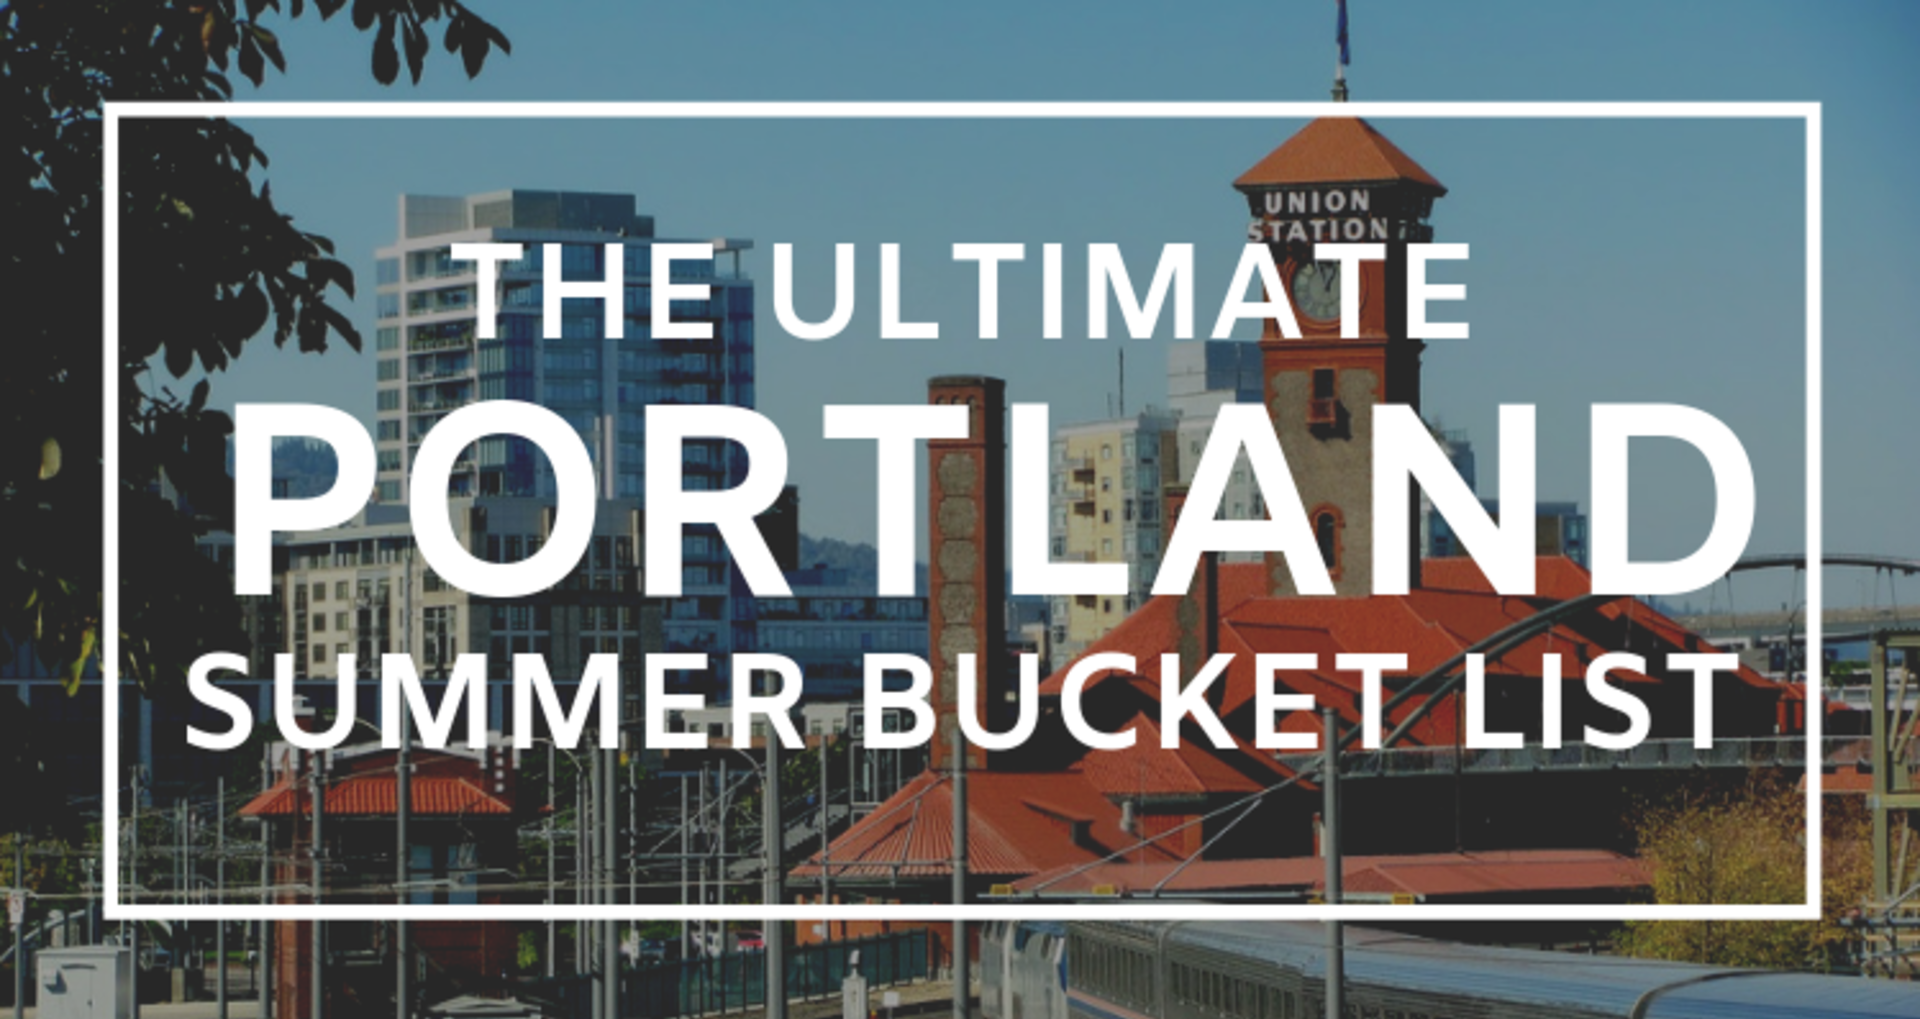 The Ultimate Portland Summer Bucket List